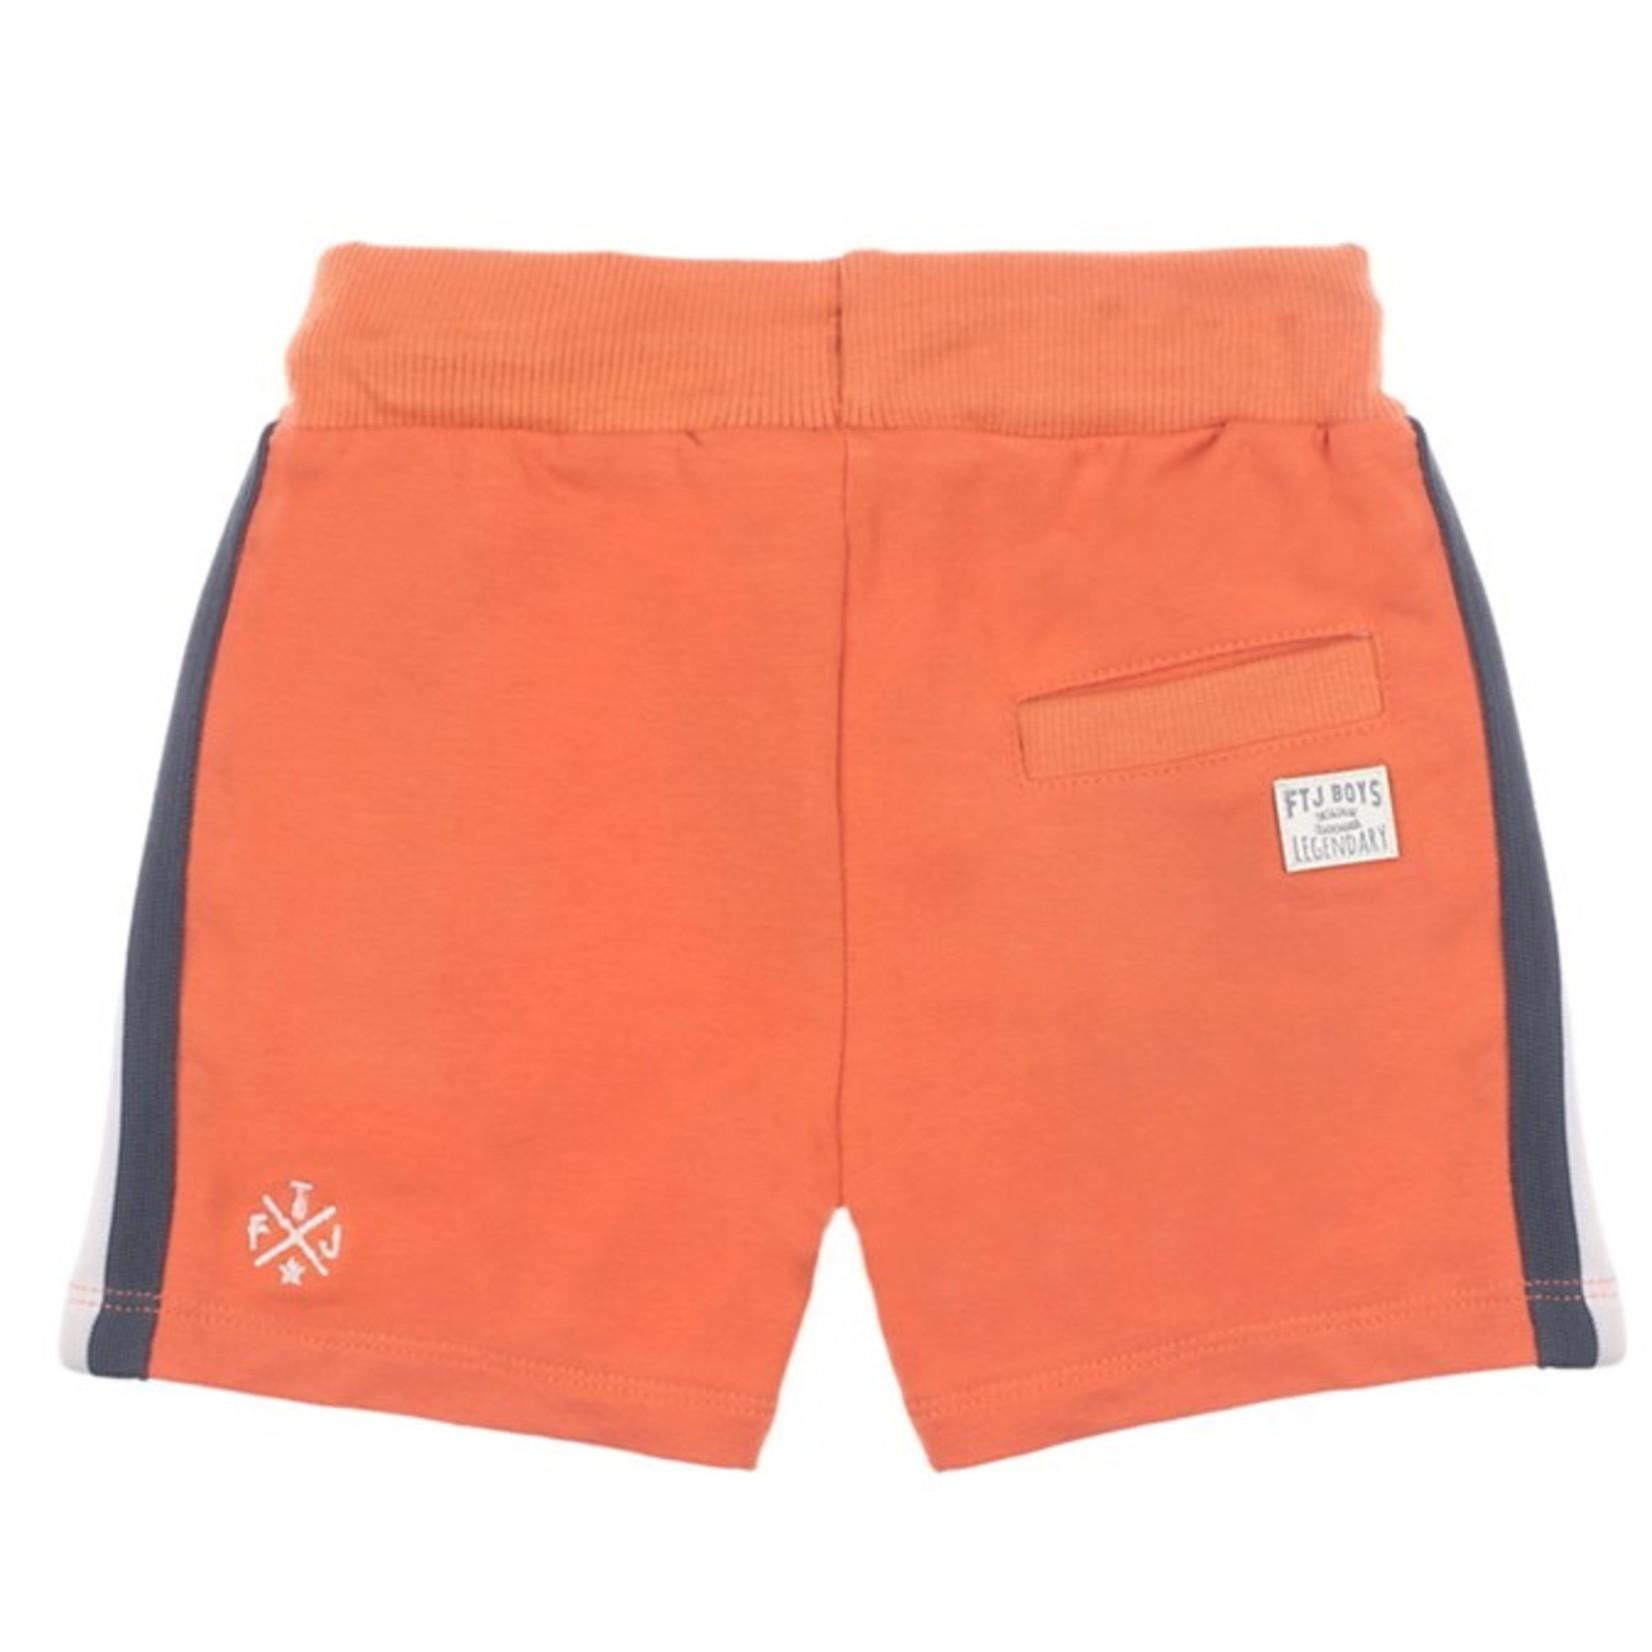 Feetje shorts maat 68